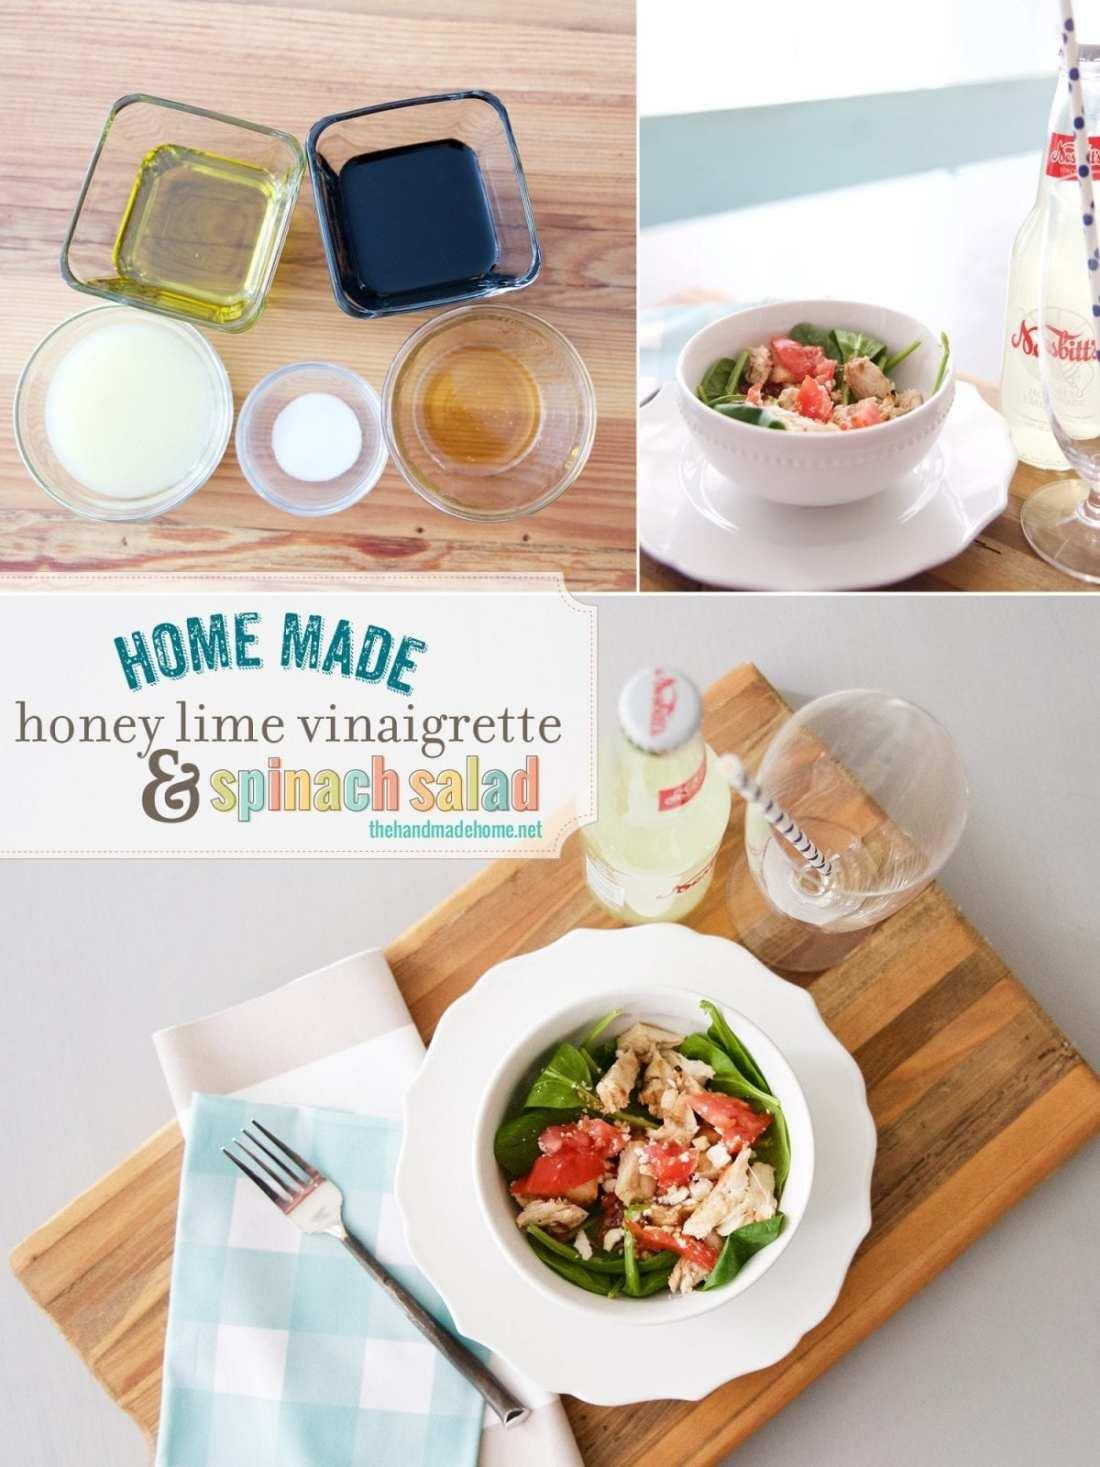 homemade_honey_lime_vinaigrette_and_spinach_salad